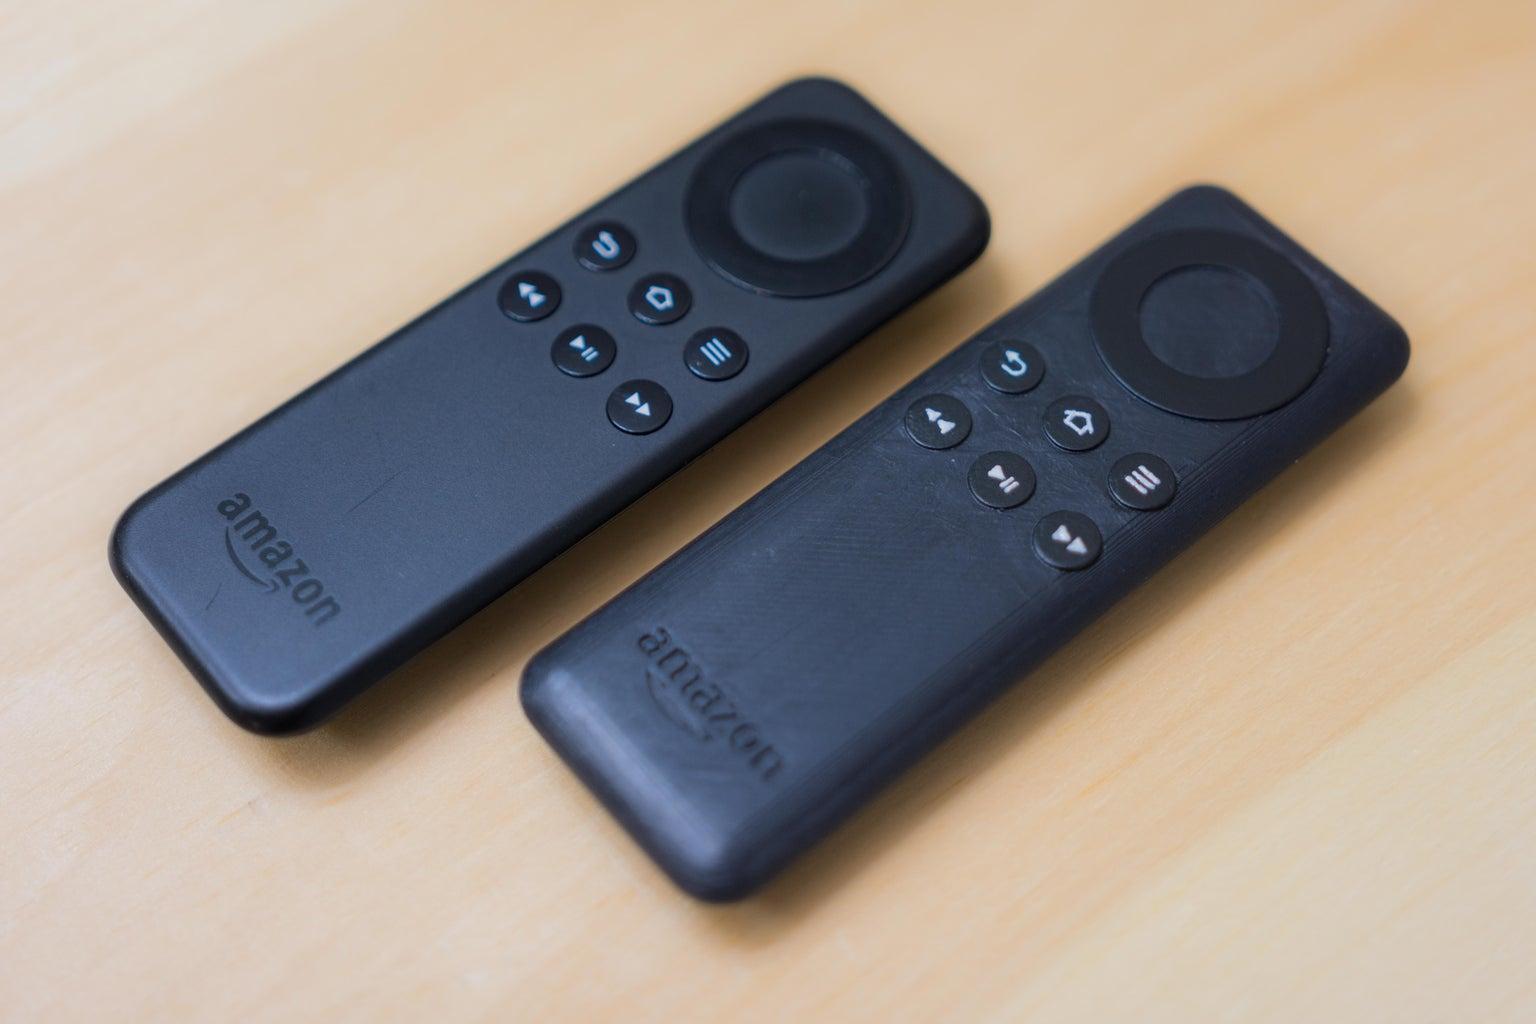 3D Printed Decoy TV Remote